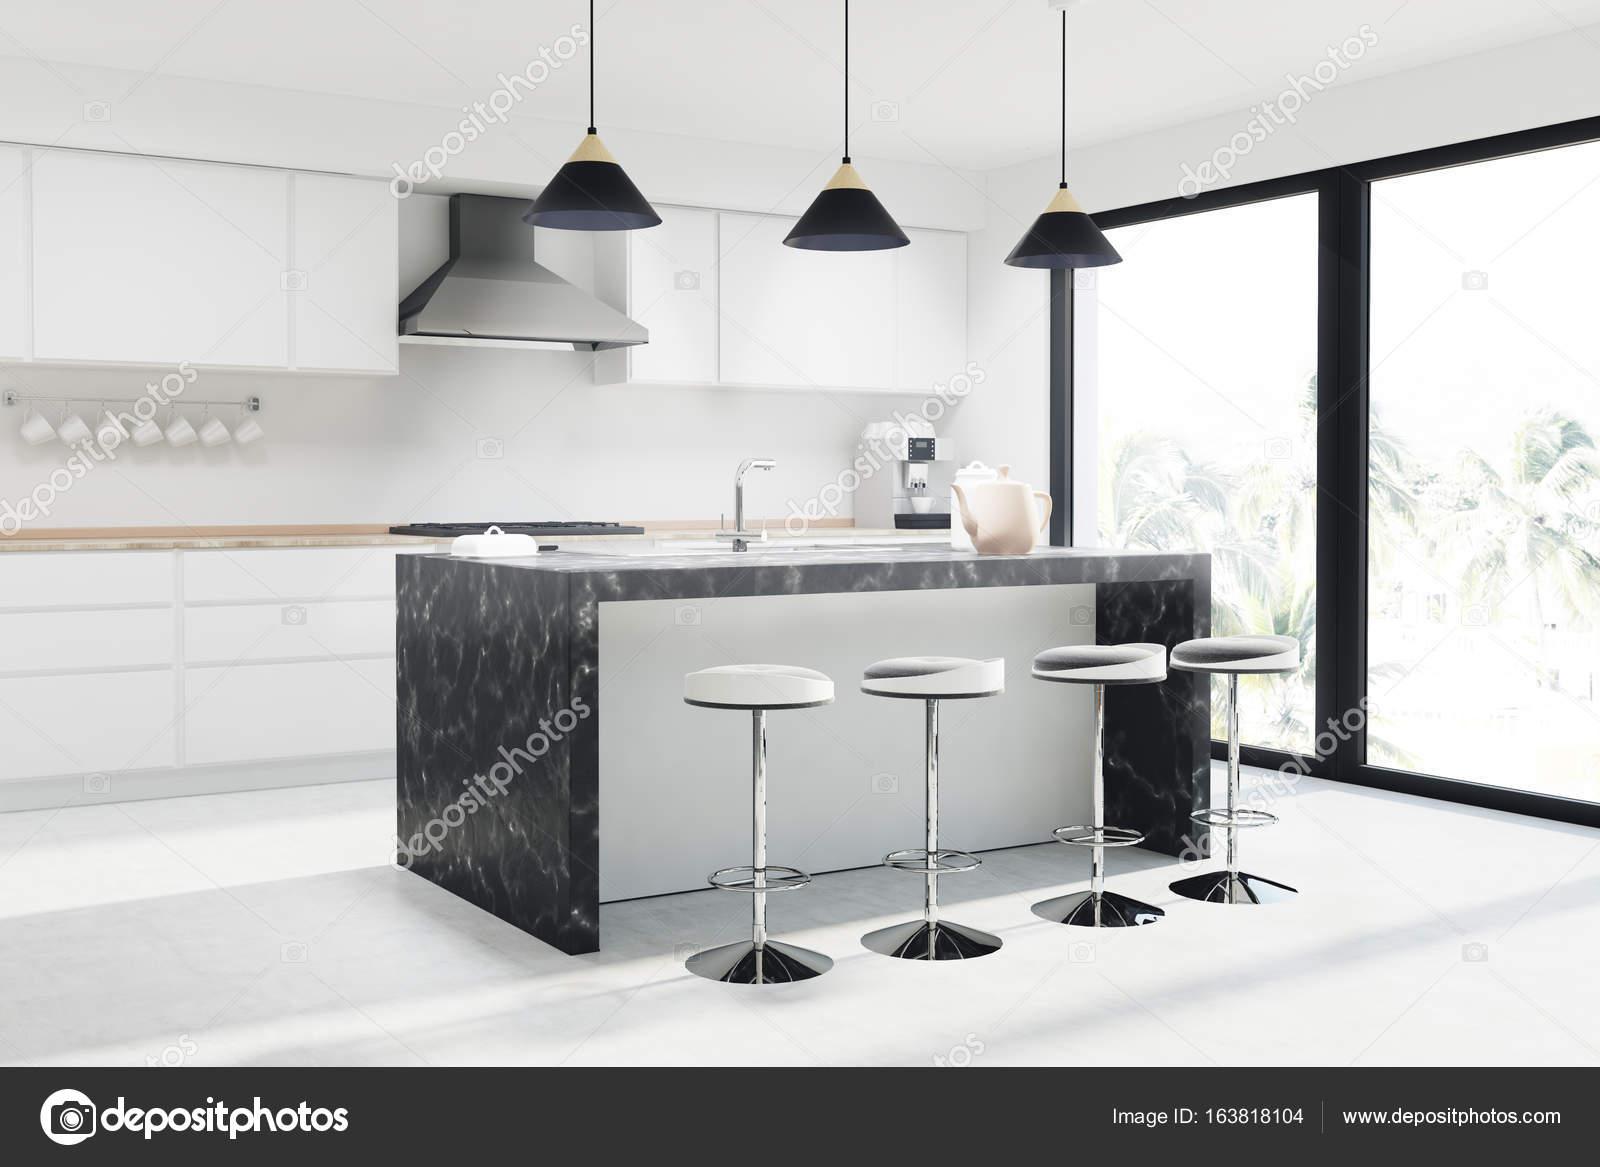 Bar in marmo bianco cucina sgabelli u foto stock denisismagilov